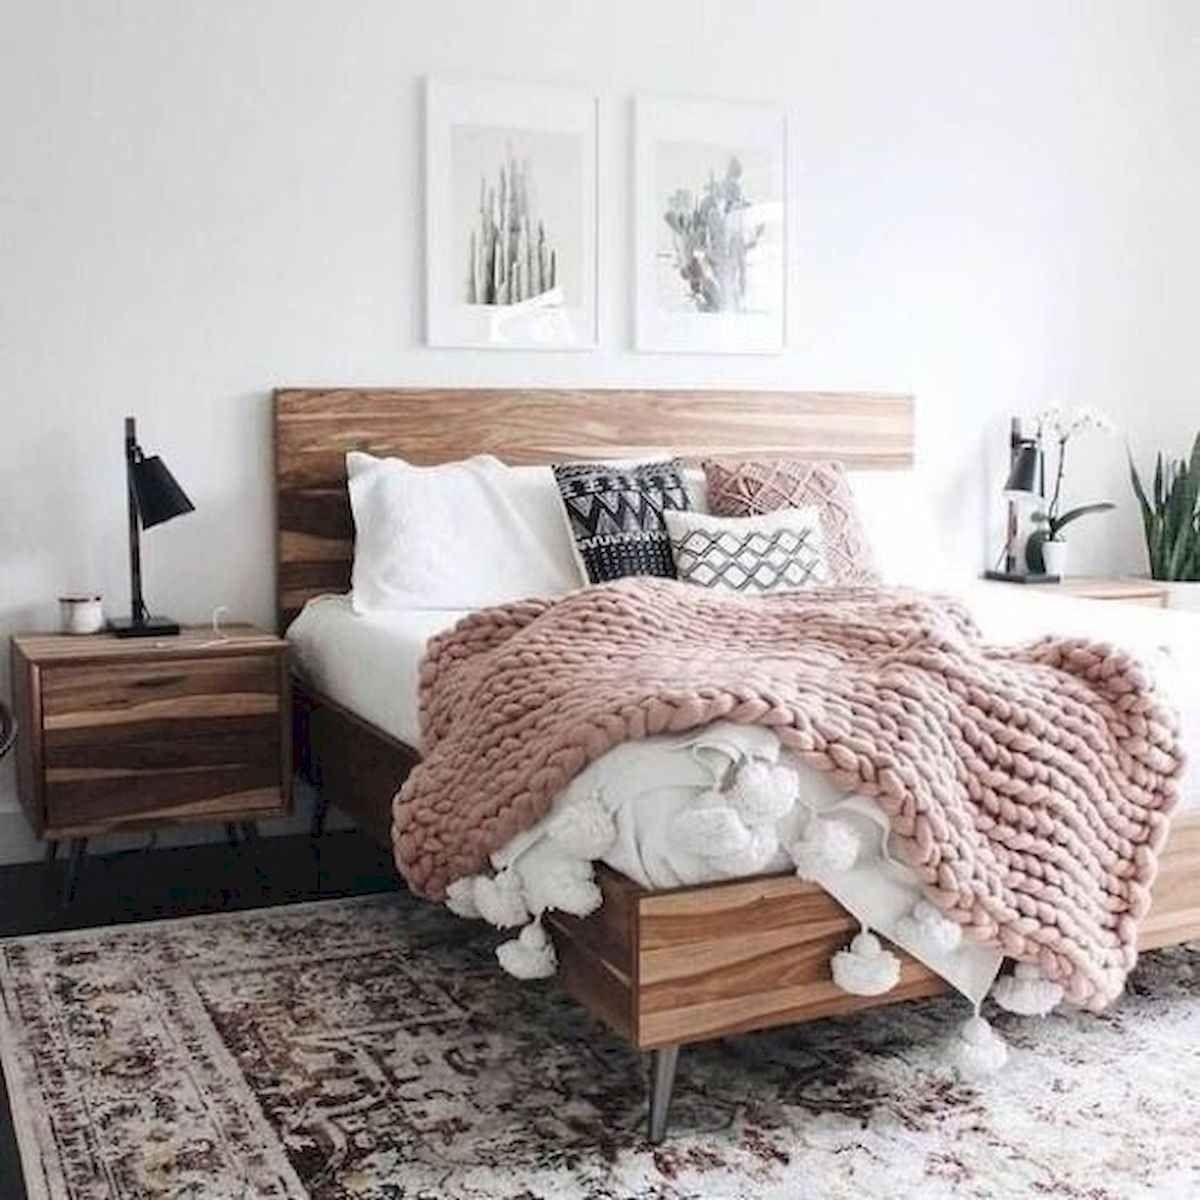 60 Adorable Modern Farmhouse Bedroom Design Ideas And Decor Ide